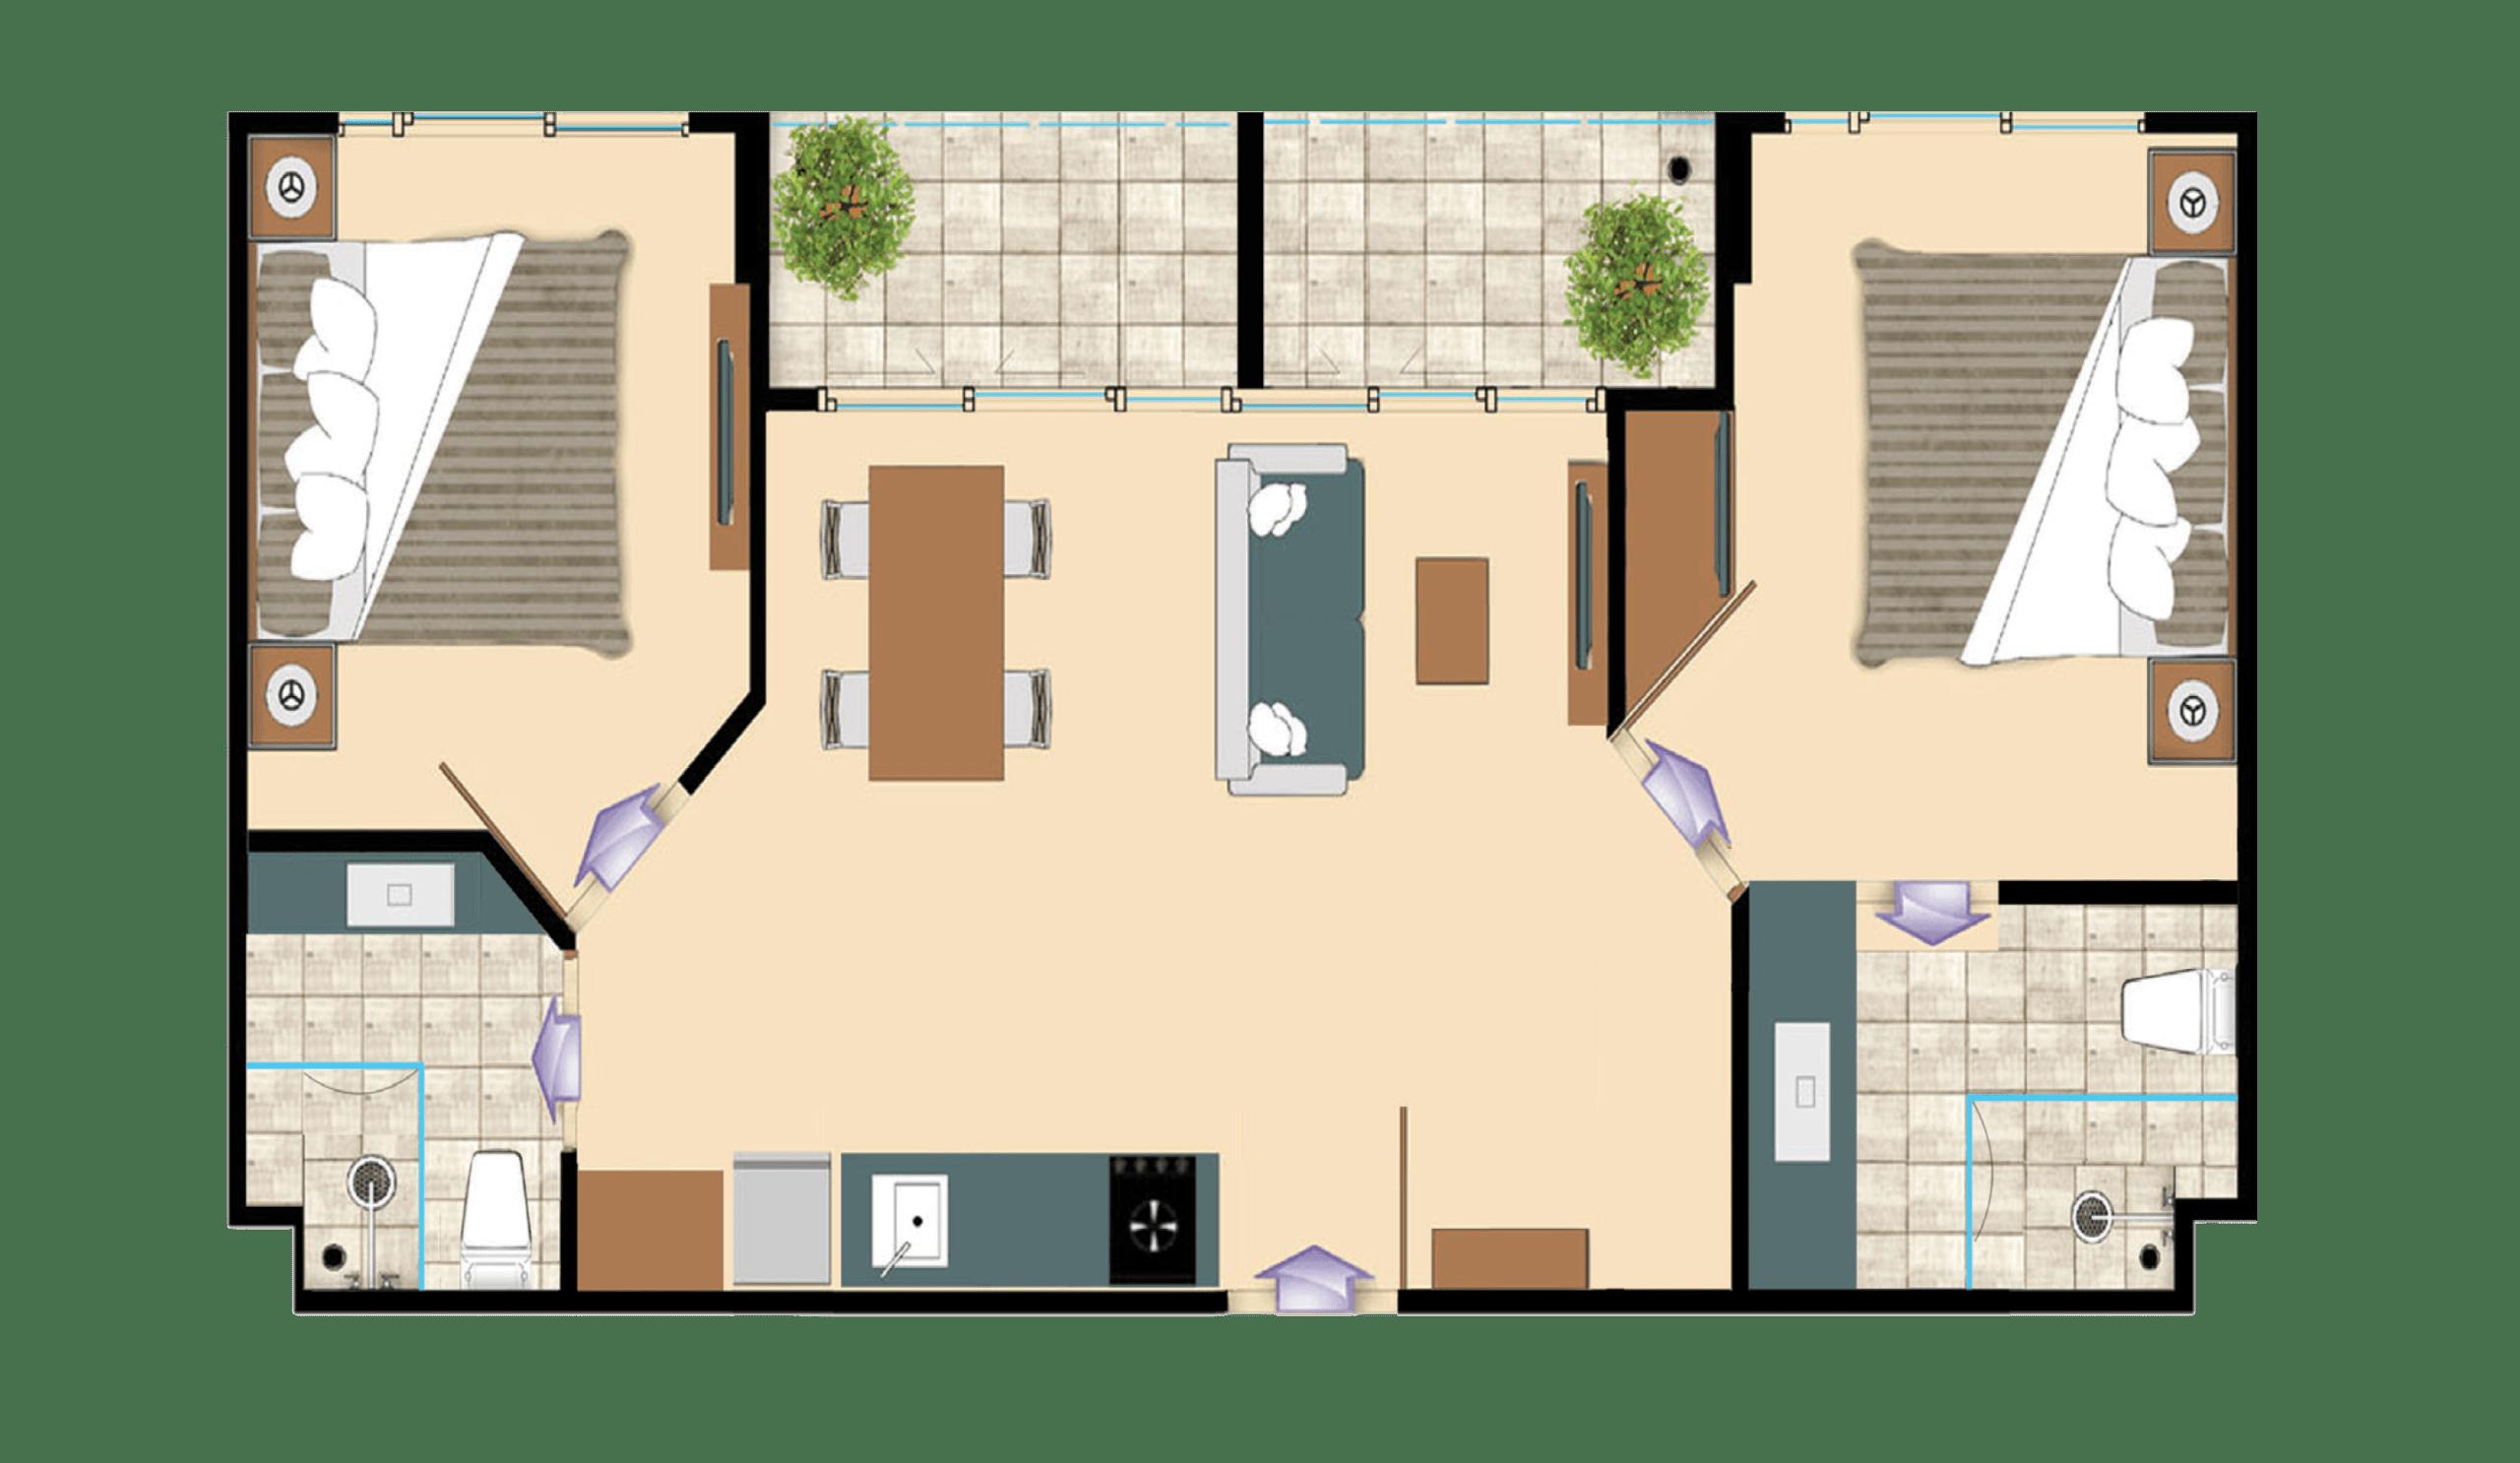 2 Bedroom Olympus City Garden Pattaya Real Estate for sale